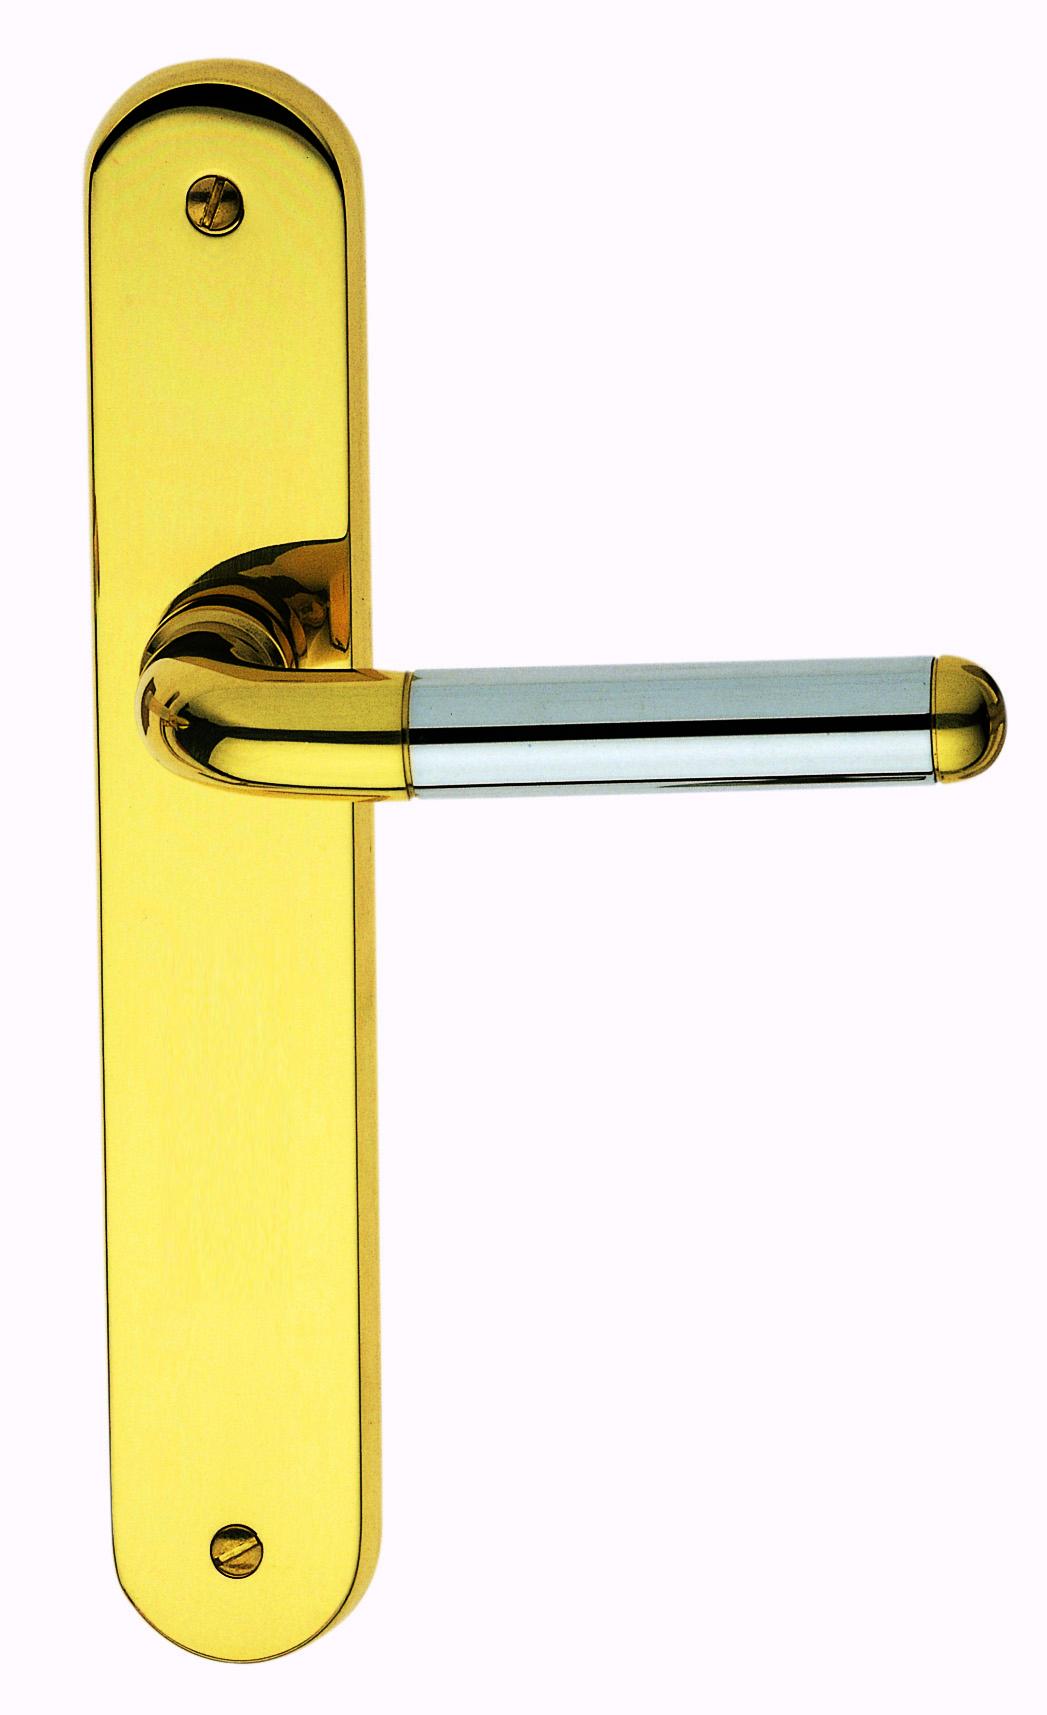 Poign e de porte int rieure design en laiton poli et for Poignet de porte en anglais